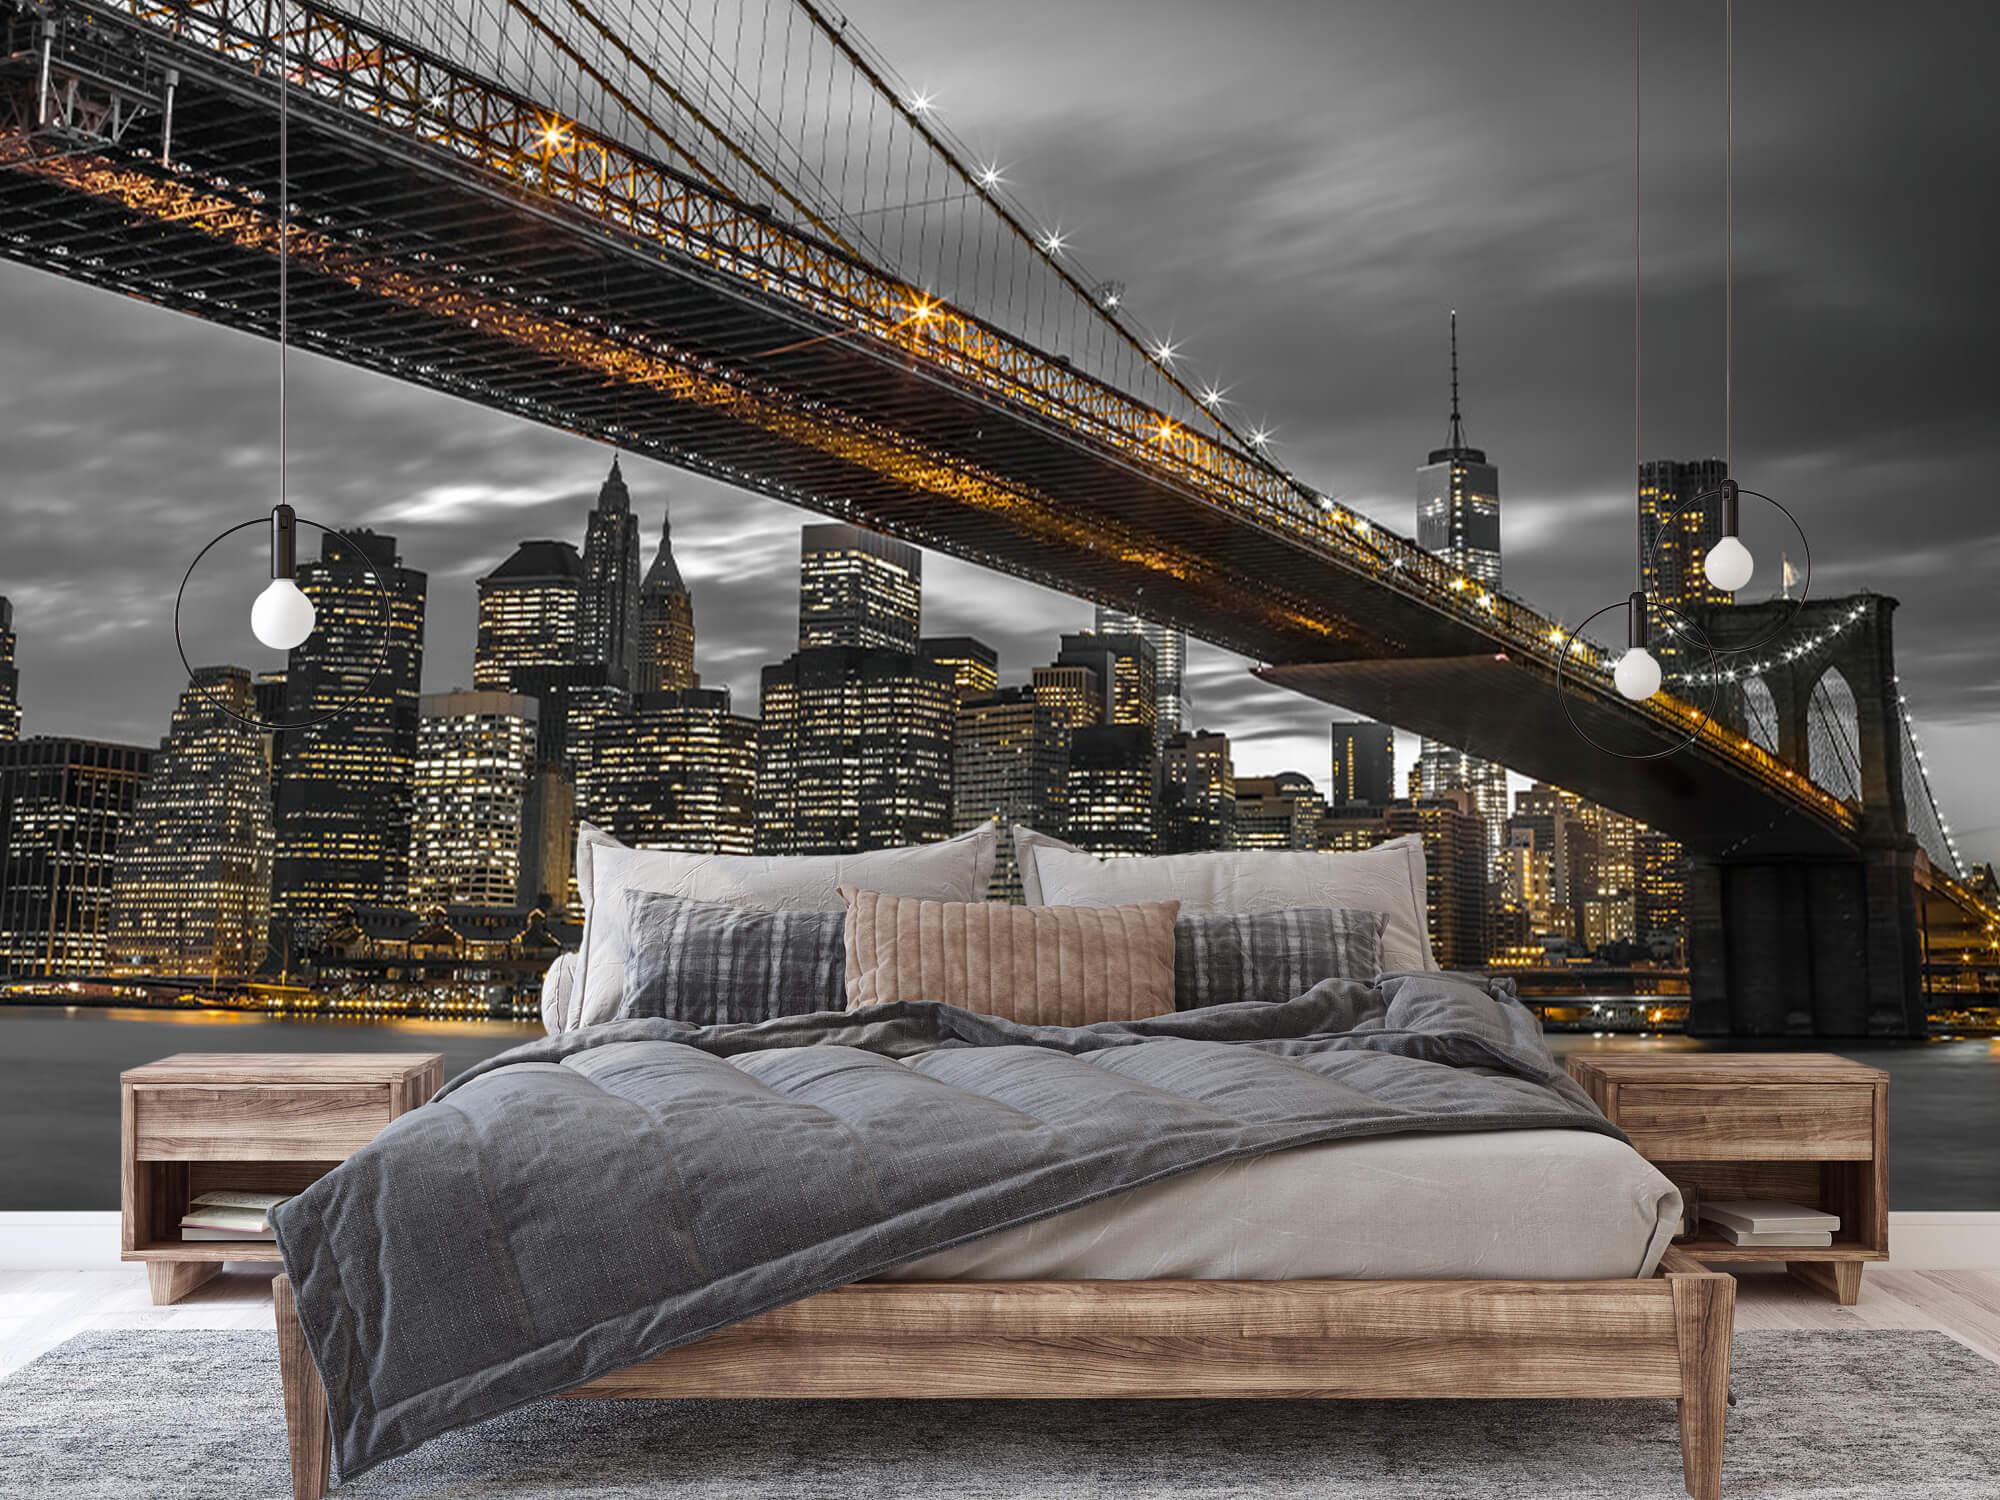 Brooklyn Bridge, New York 1